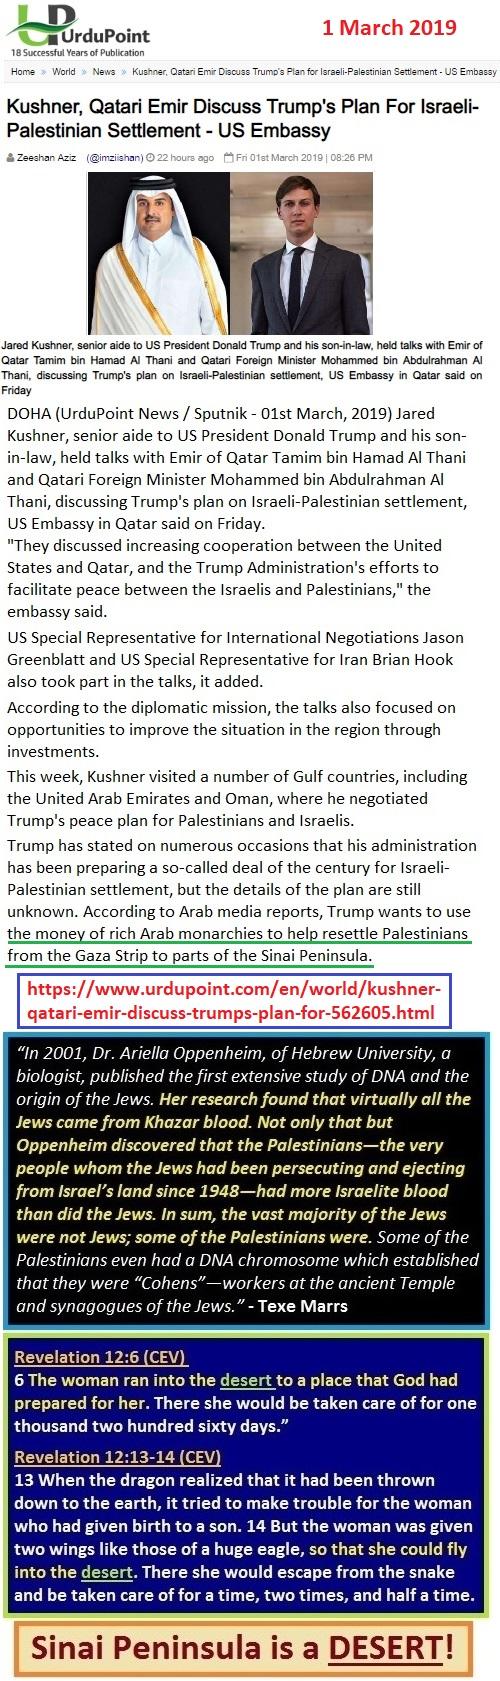 https://www.urdupoint.com/en/world/kushner-qatari-emir-discuss-trumps-plan-for-562605.html